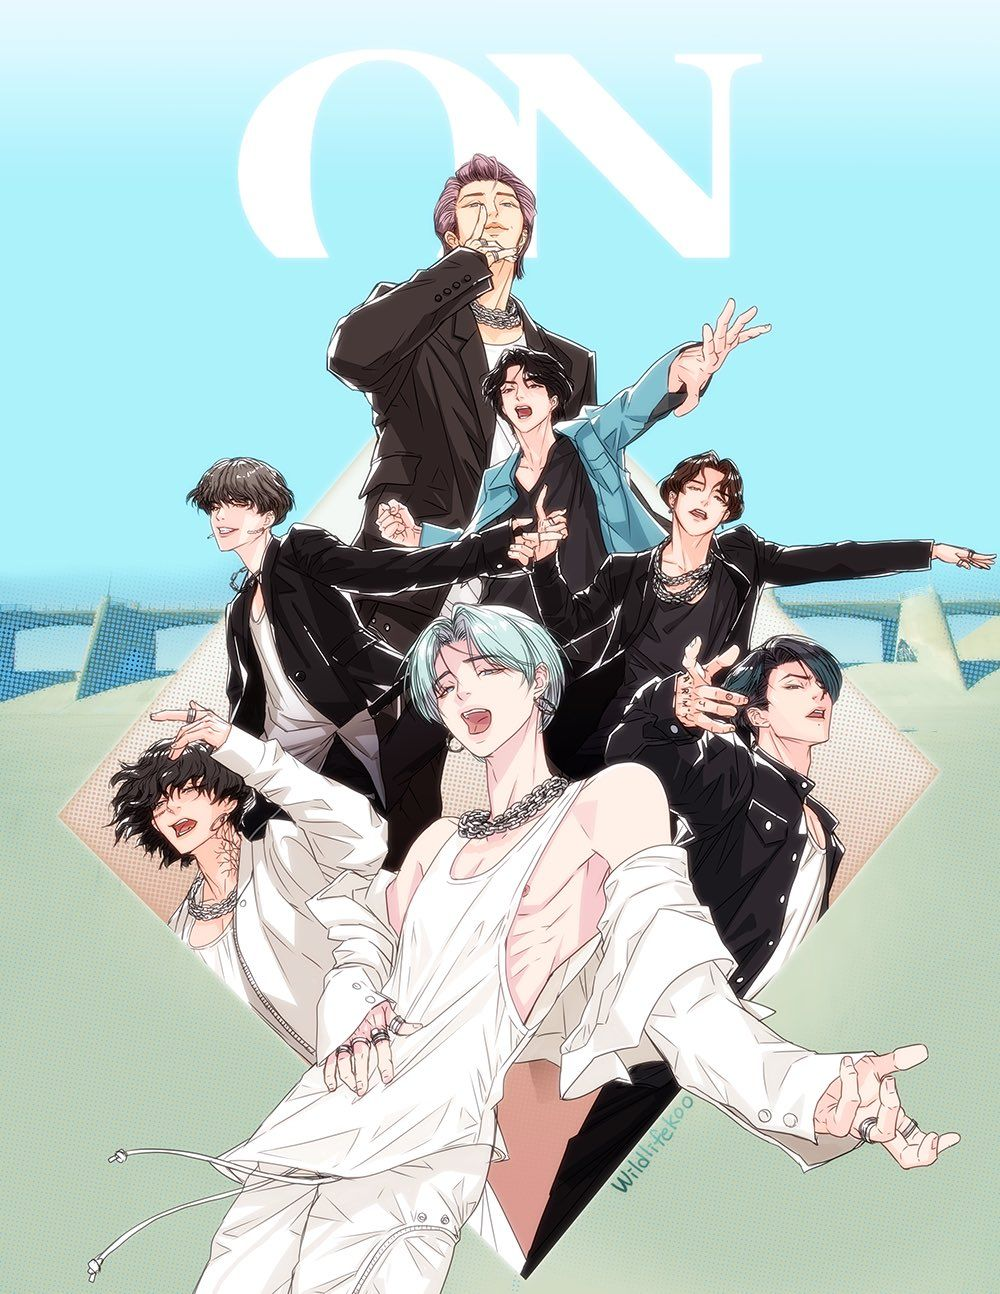 Bts anime wallpaper hd